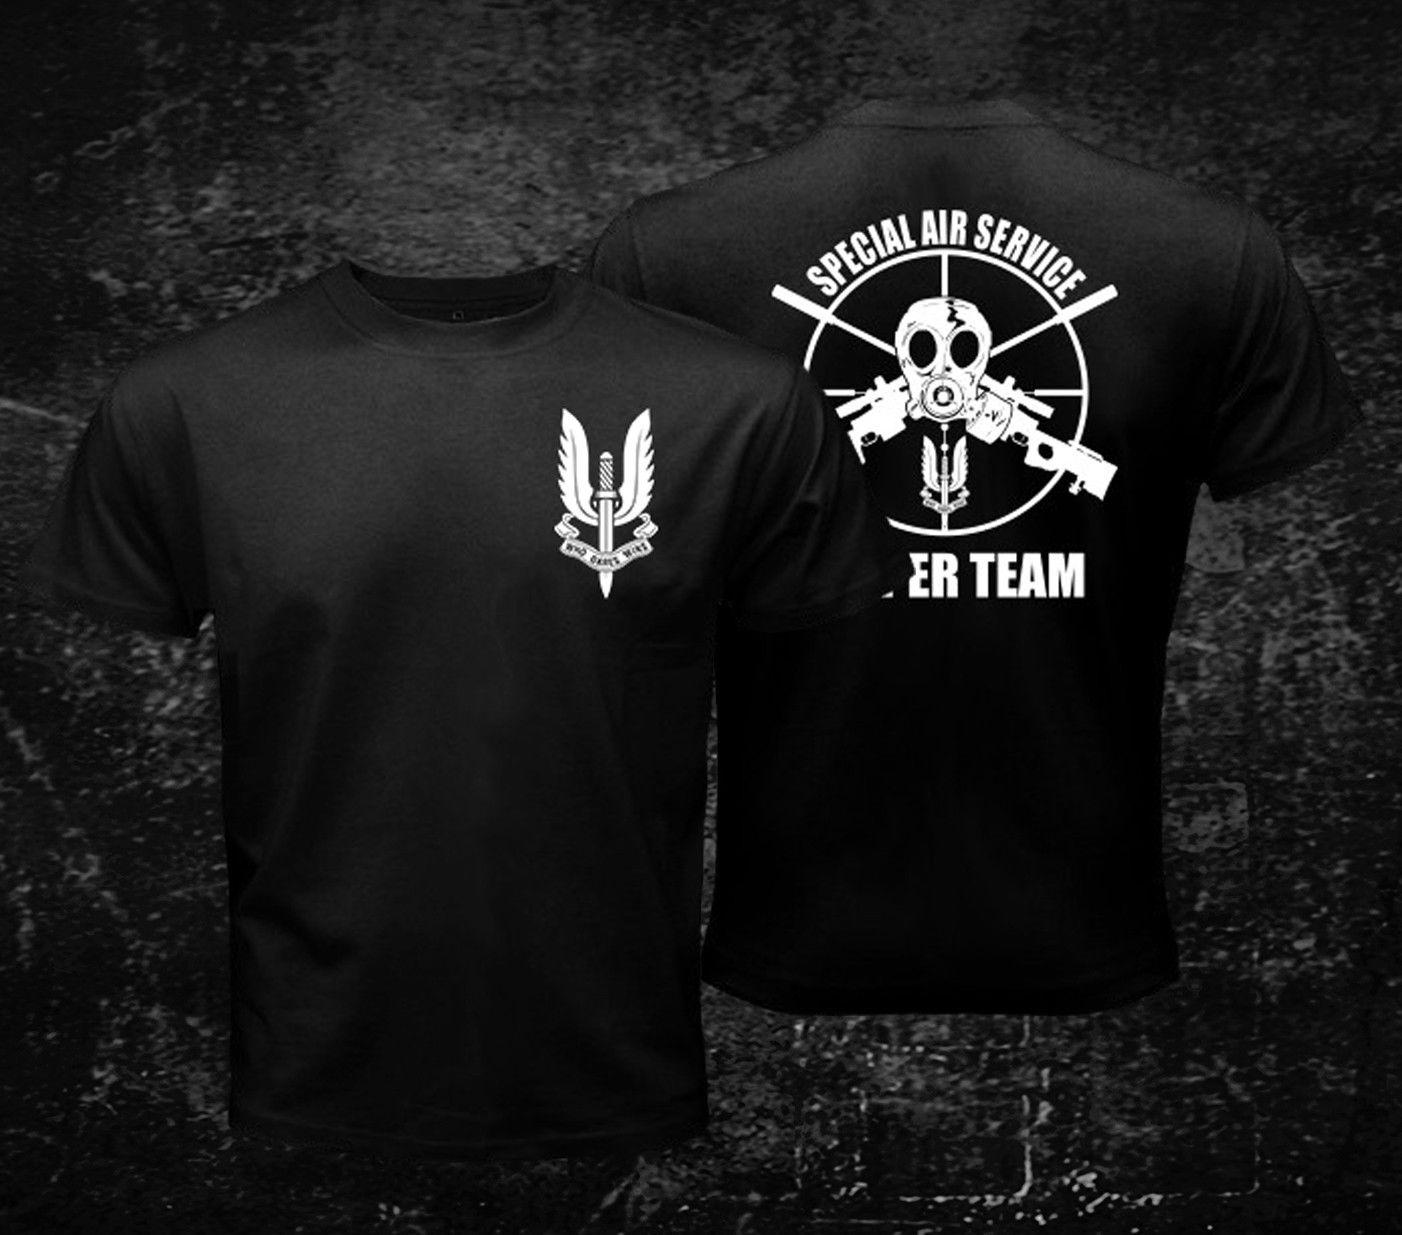 2019 engraçado sas sniper-camiseta preta masculina personalizada camiseta dupla face unisex